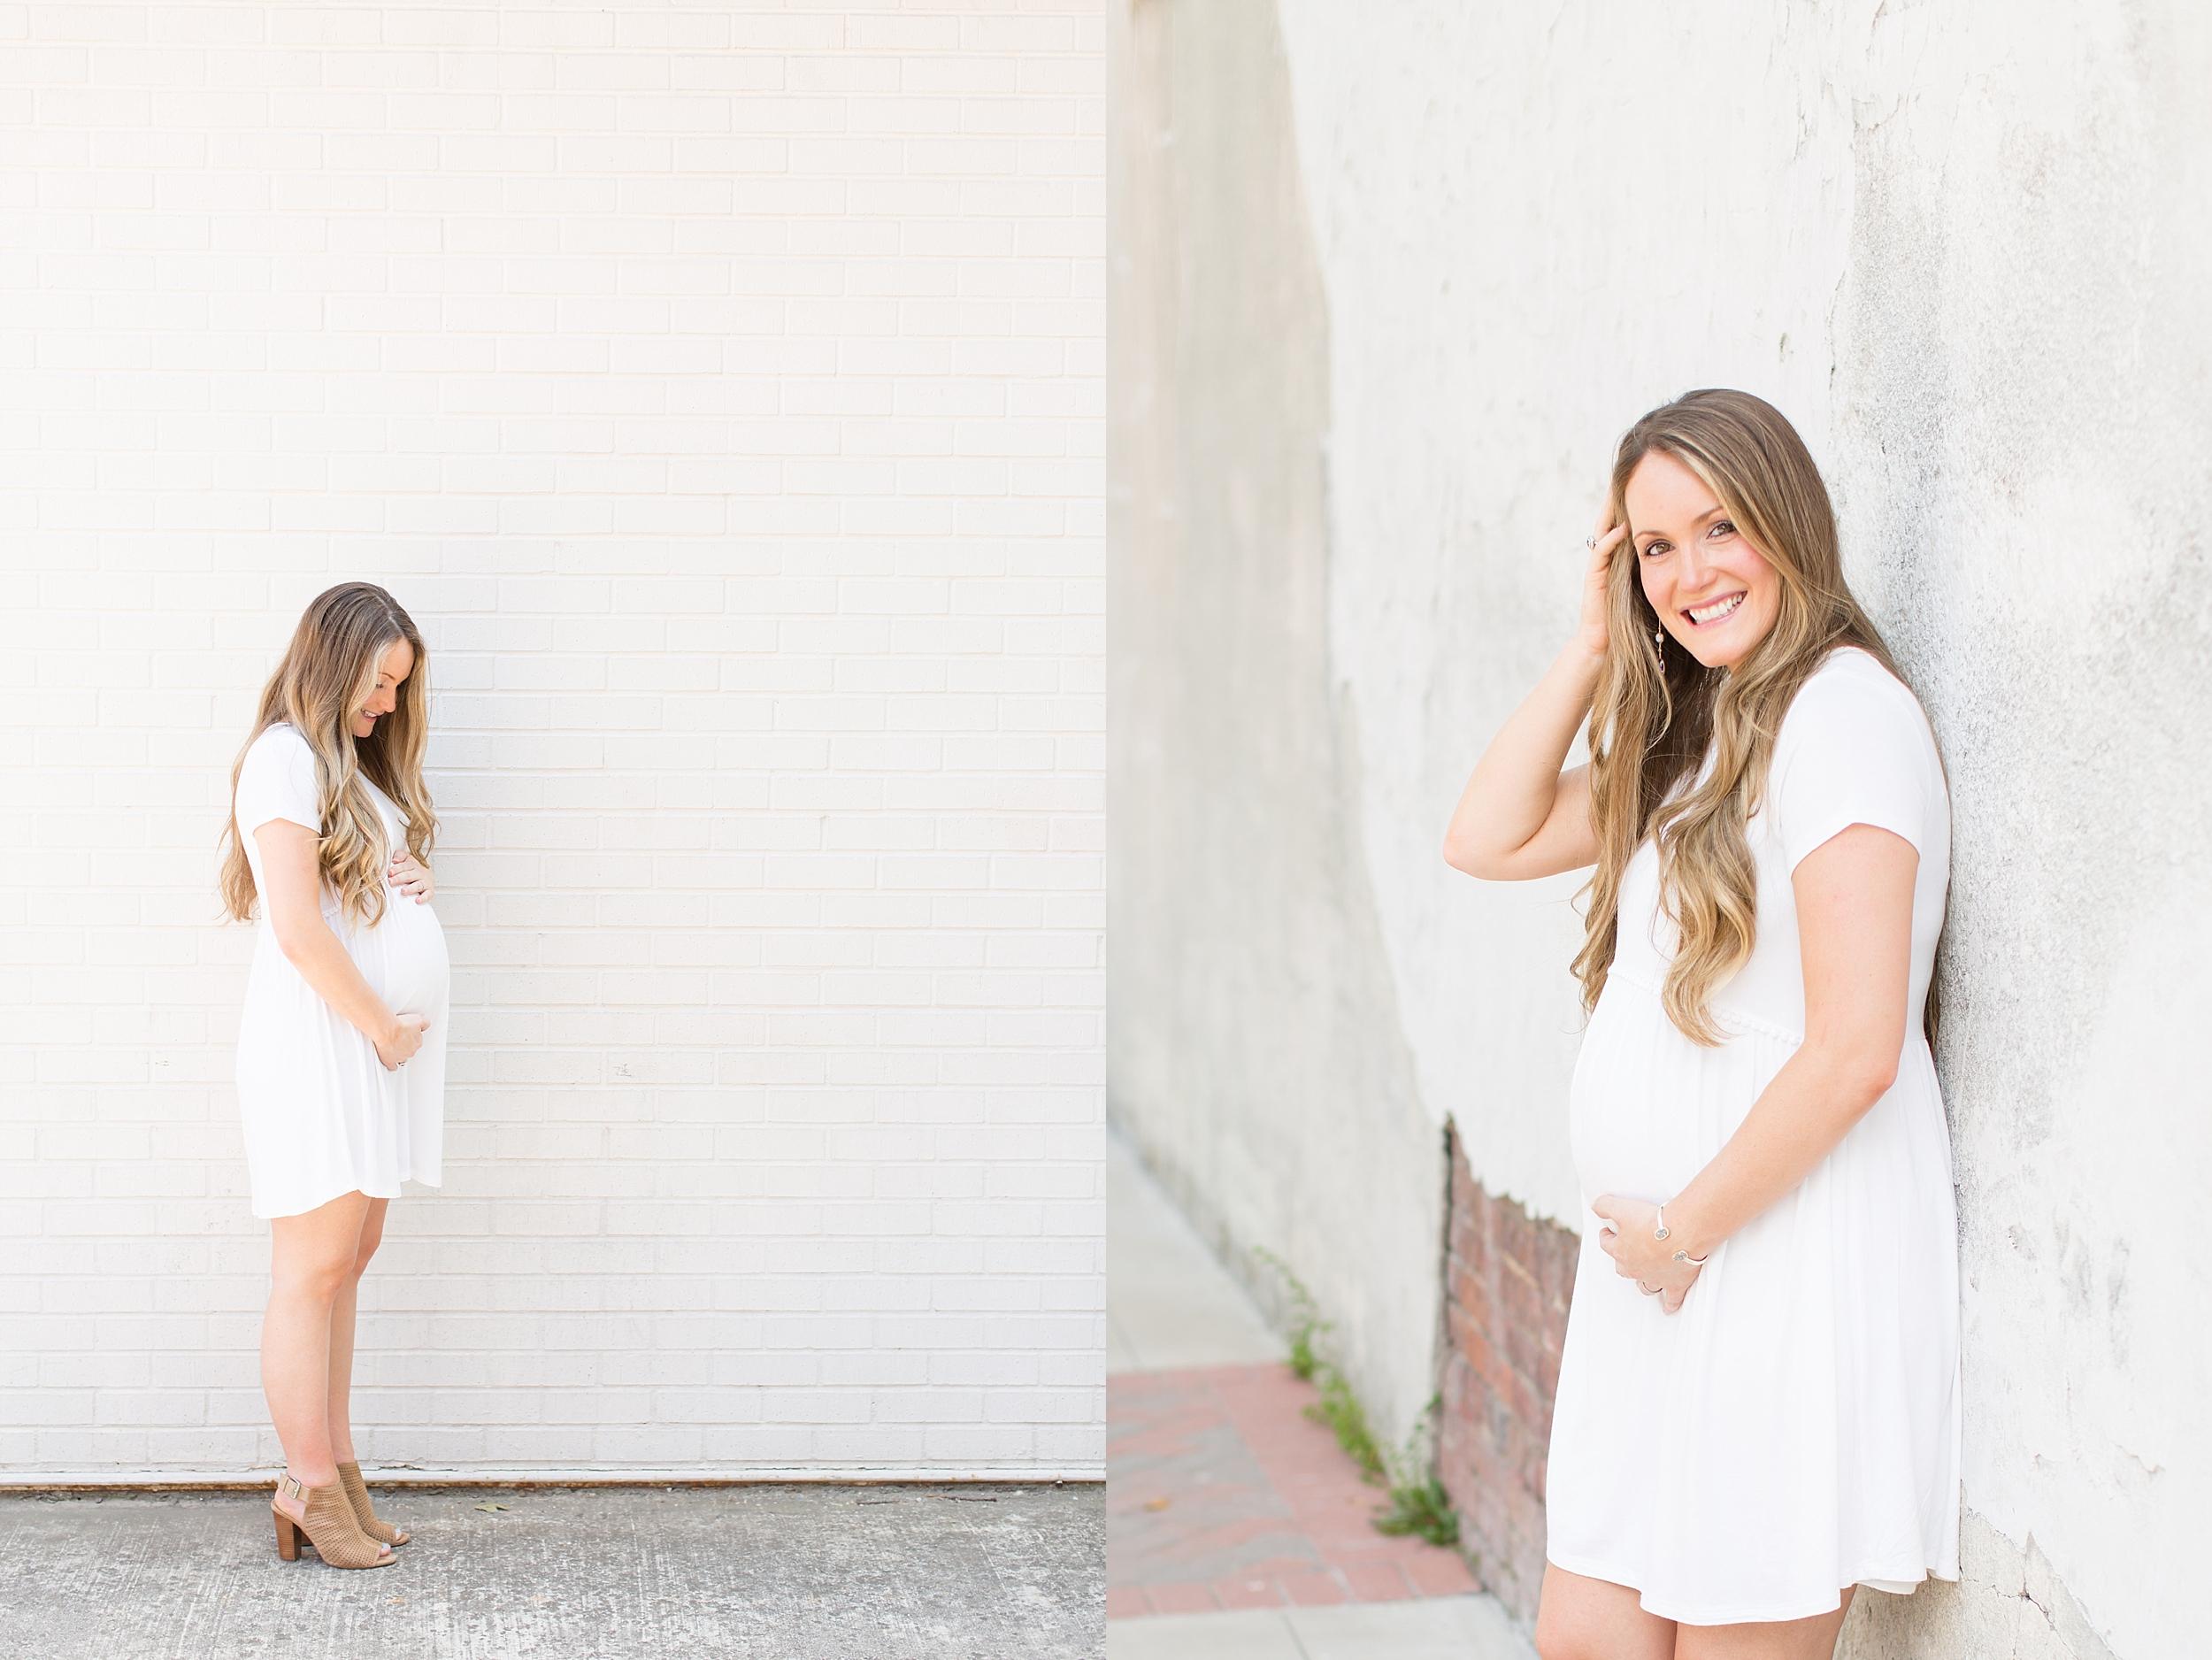 Landon-Schneider-Photography-Holt-Maternity-Session-McKinney-Texas_0019.jpg